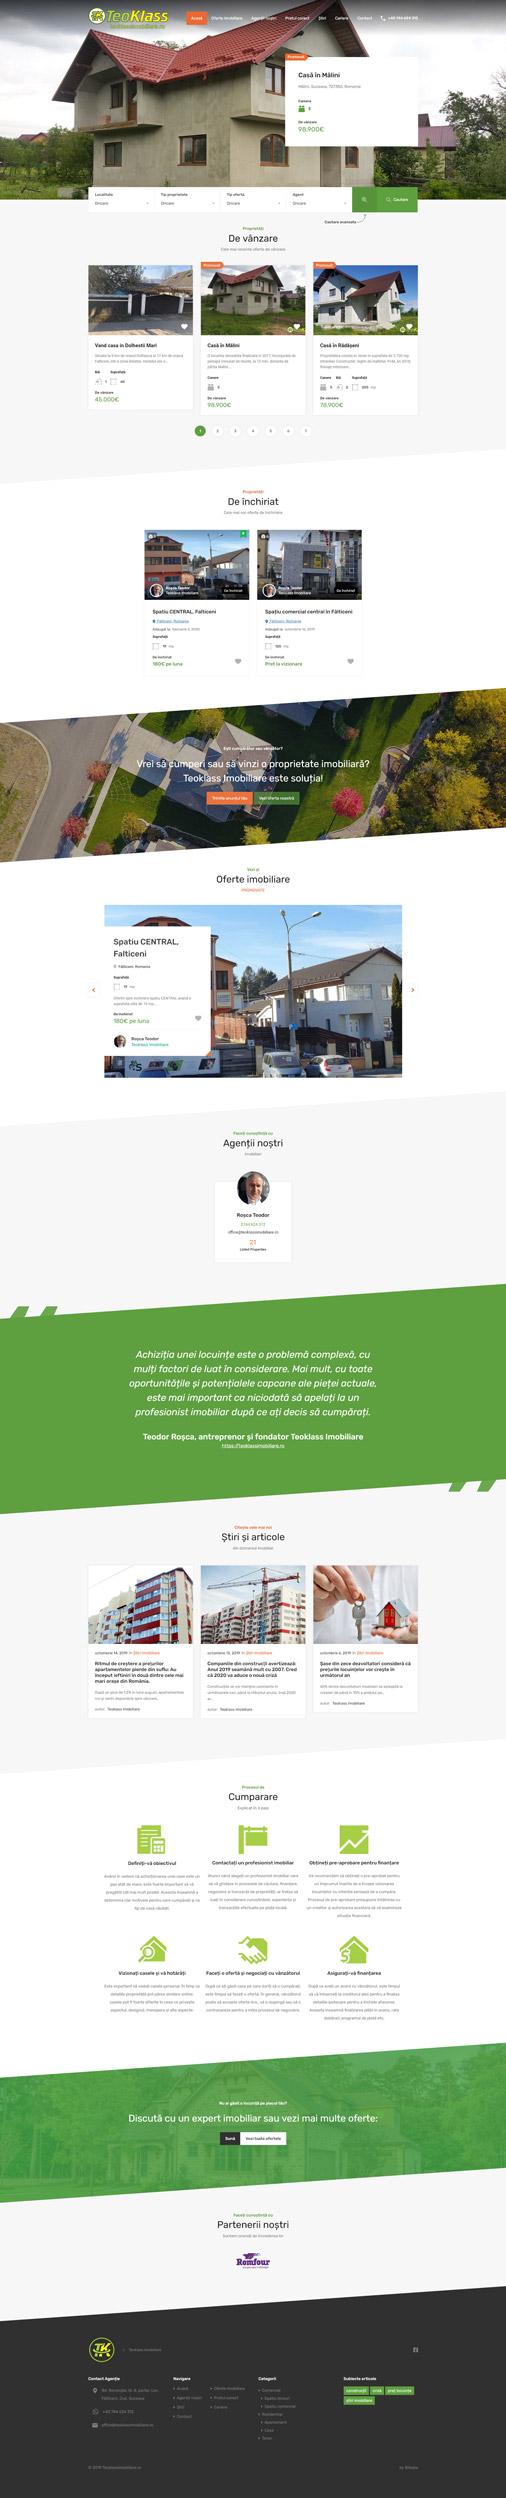 teoklassimobiliare.ro - Portofoliu design web Bitopia Falticeni